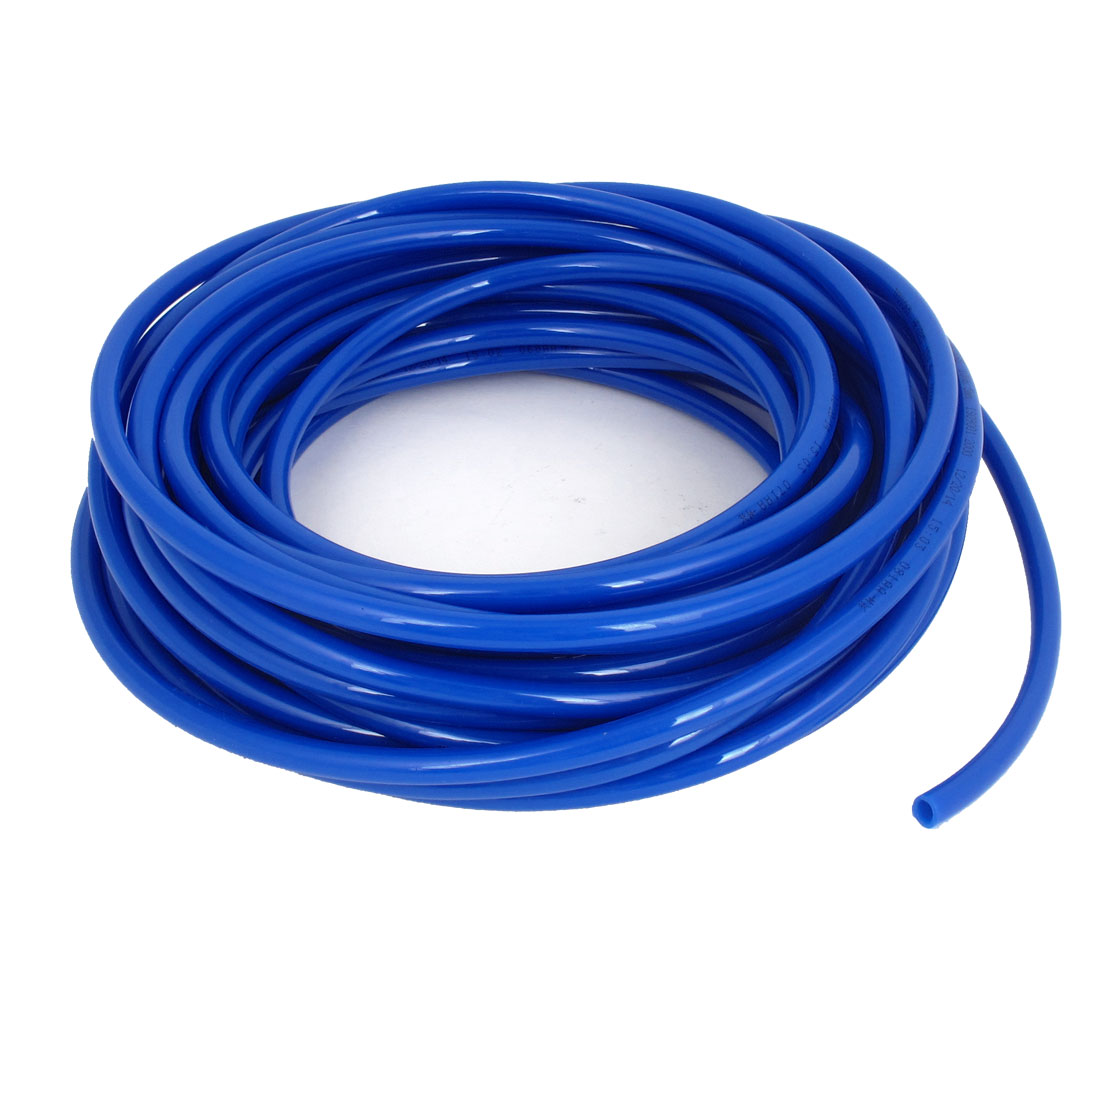 15M Long 10mmx6.5mm Air Fuel Gas Polyurethane Flexible PU Hose Tube Pipe Blue